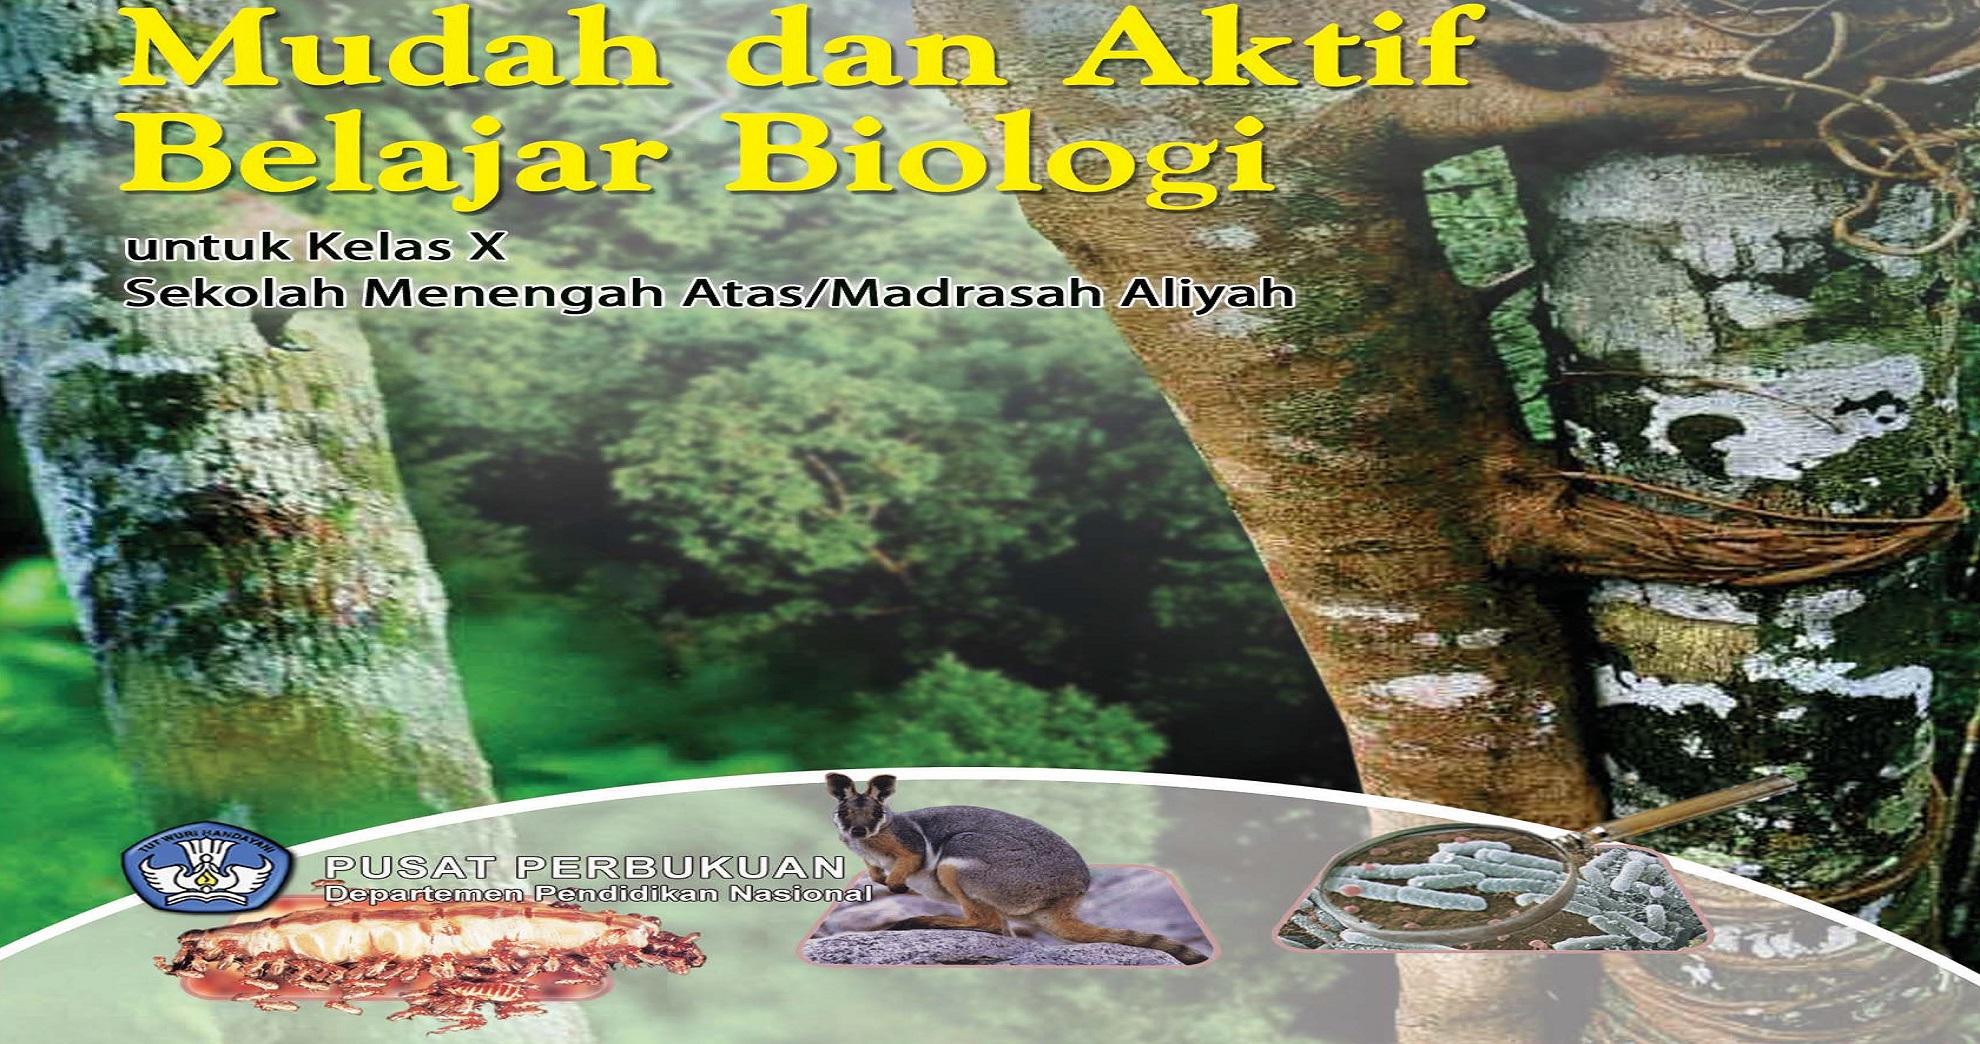 Download Buku Sekolah Elektronik (BSE) Mata Pelajaran Biologi SMA Kelas X, XI dan XII